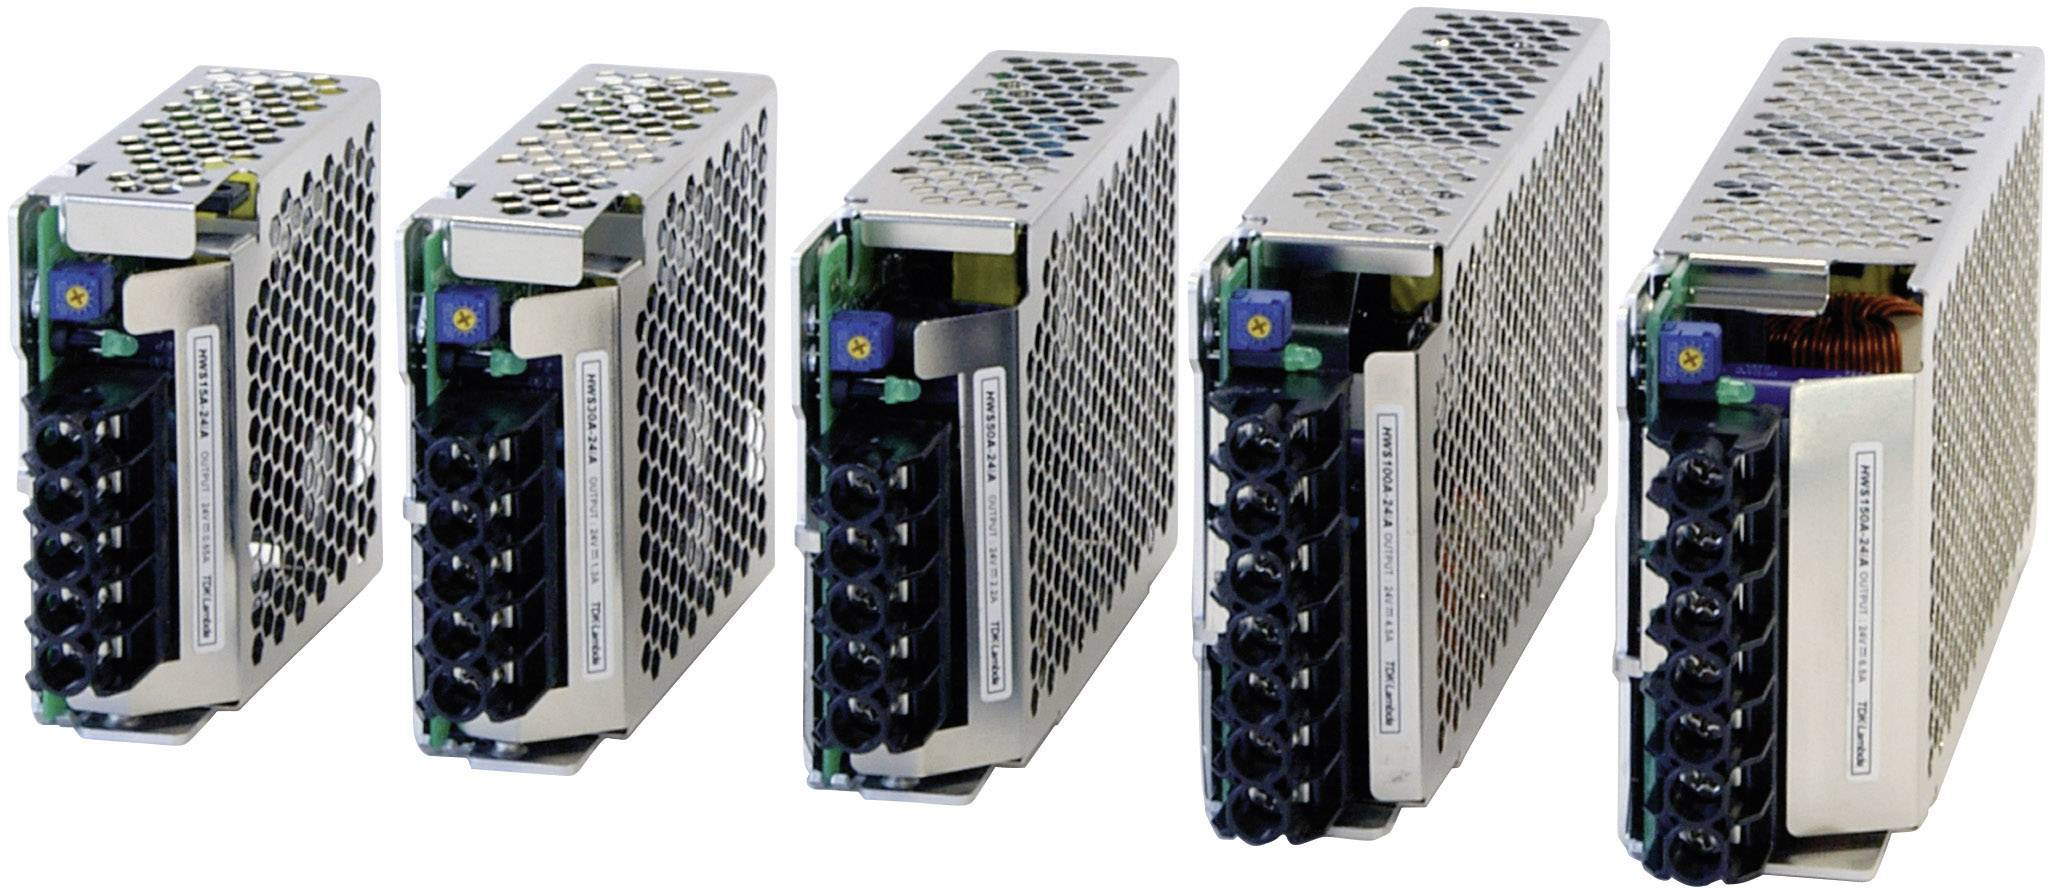 Zabudovateľný napájací zdroj TDK-Lambda HWS-100A-3/A, 3,3 V, 66 W